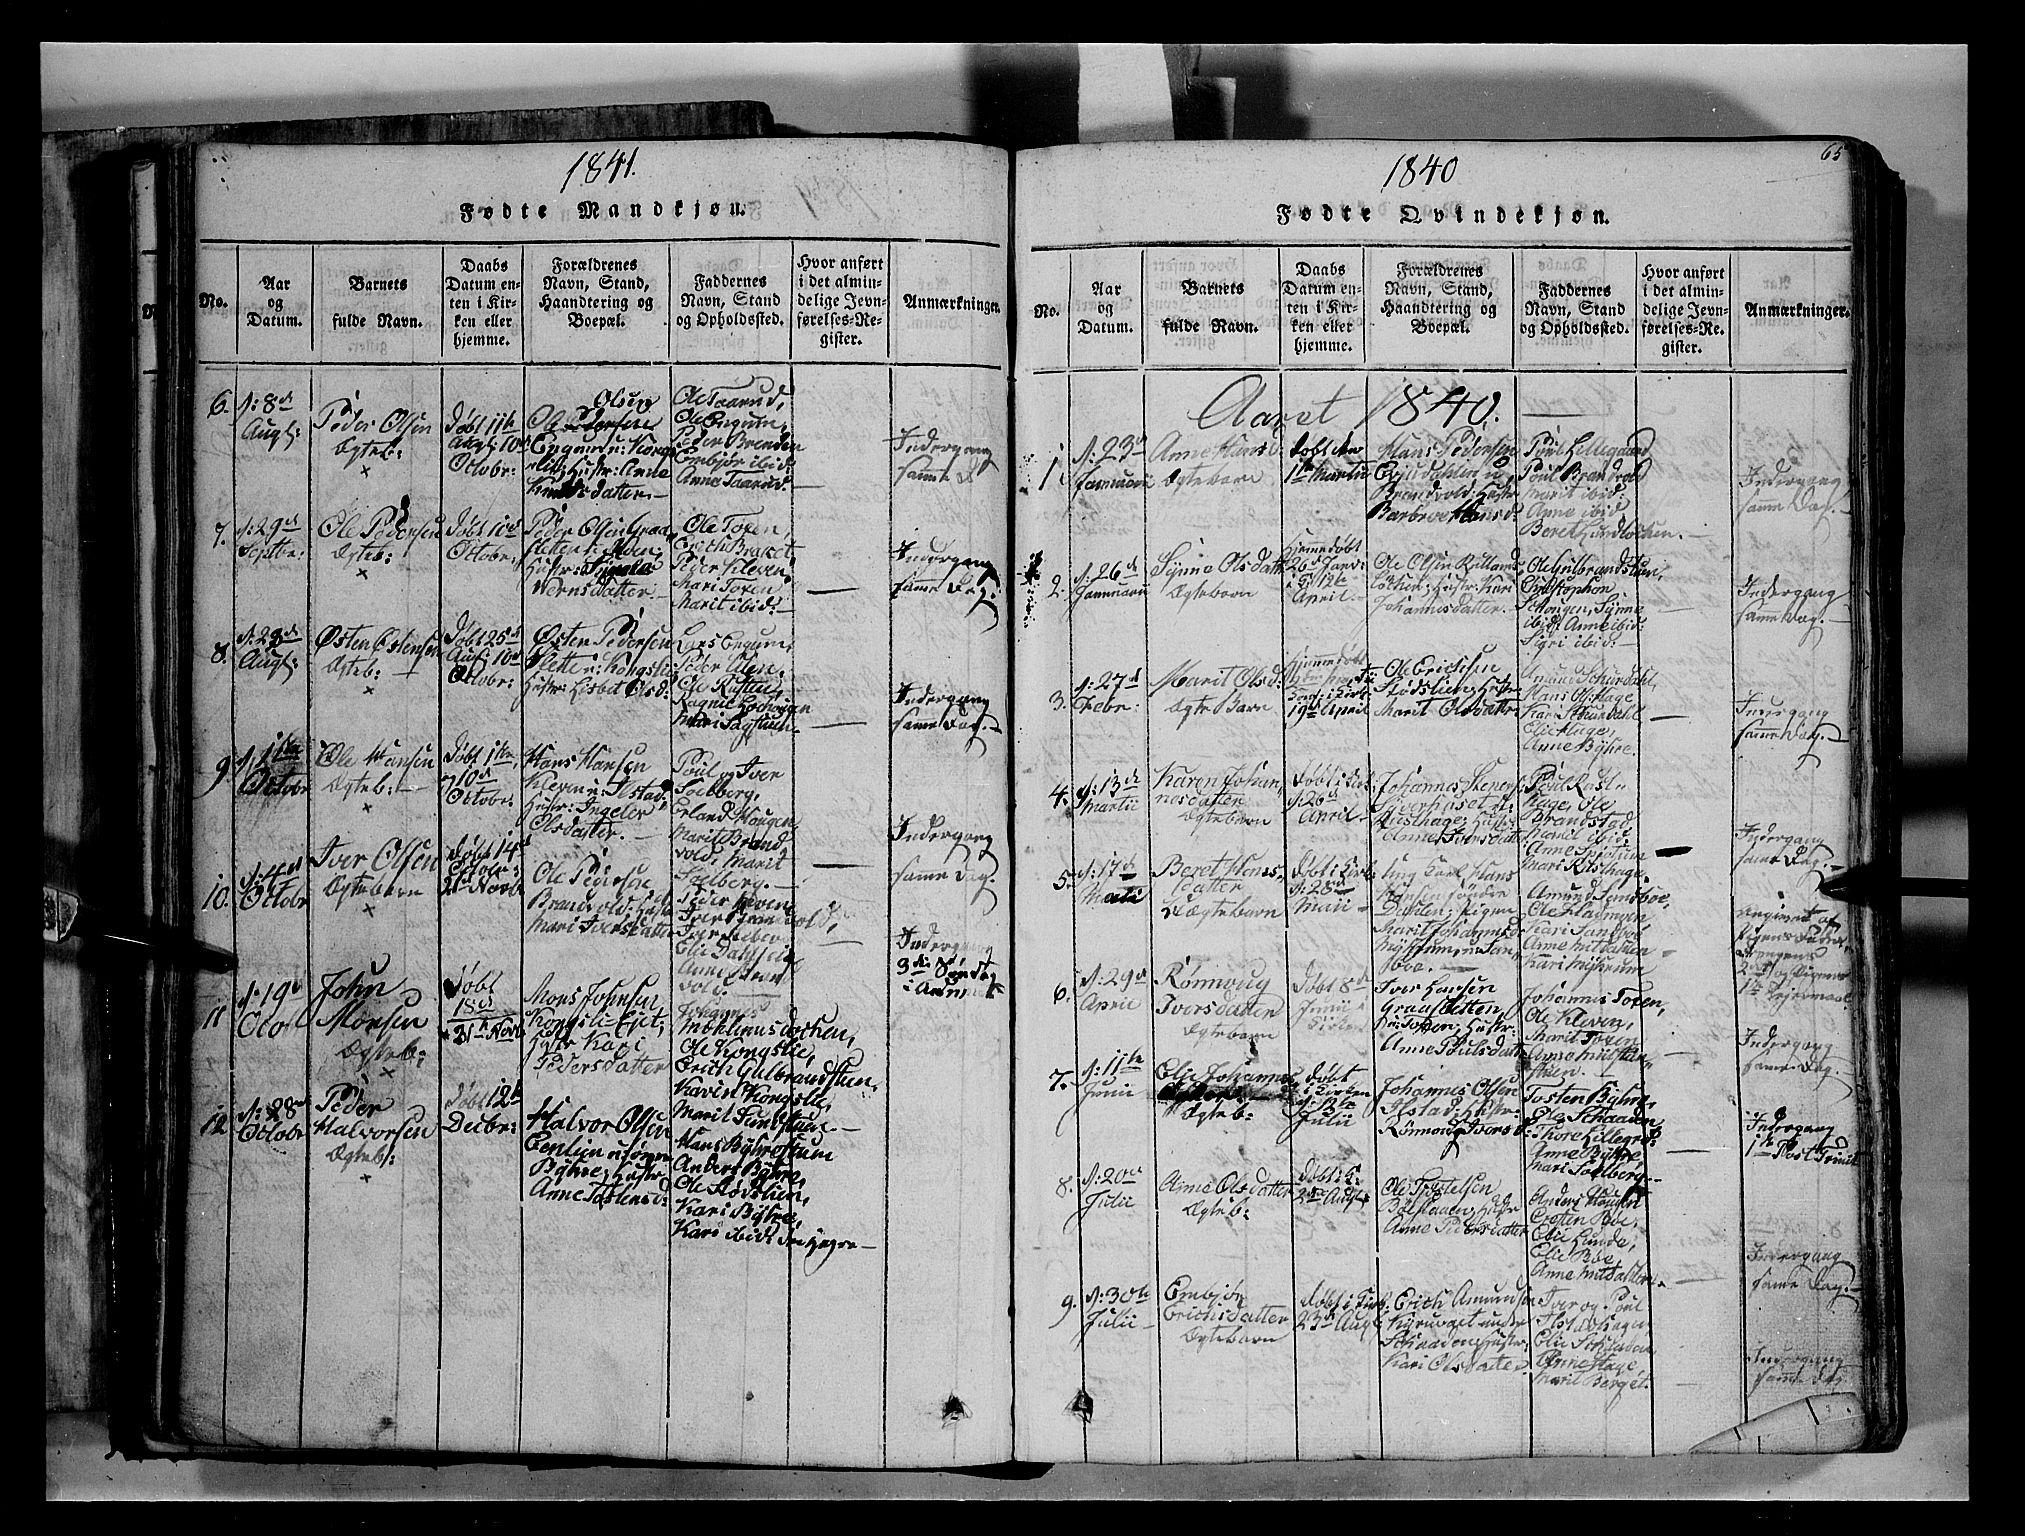 SAH, Fron prestekontor, H/Ha/Hab/L0004: Klokkerbok nr. 4, 1816-1850, s. 65